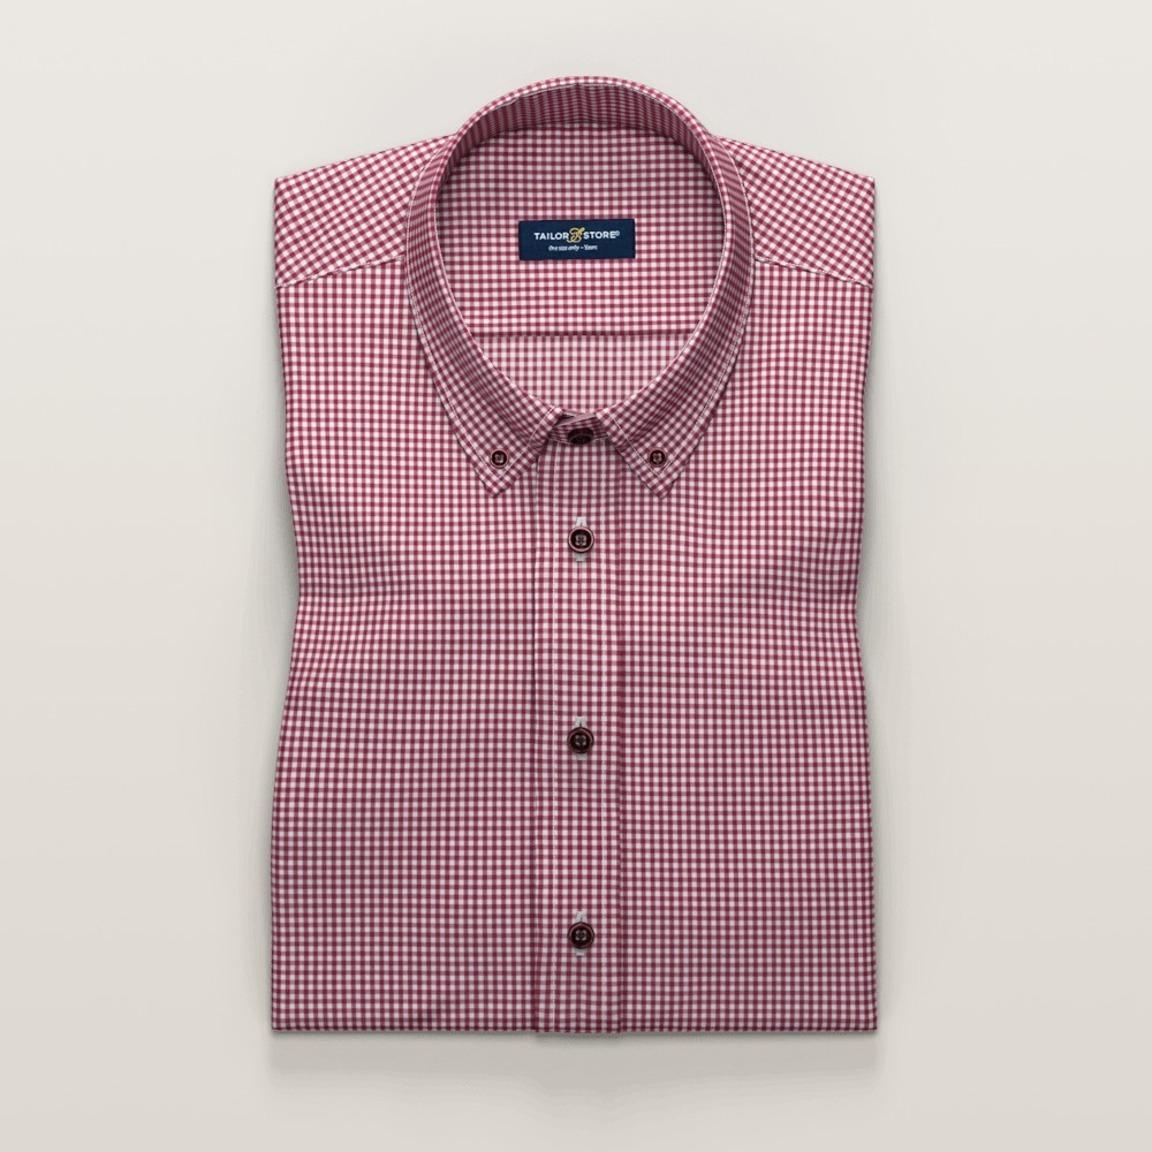 Short sleeved checked dark red business shirt